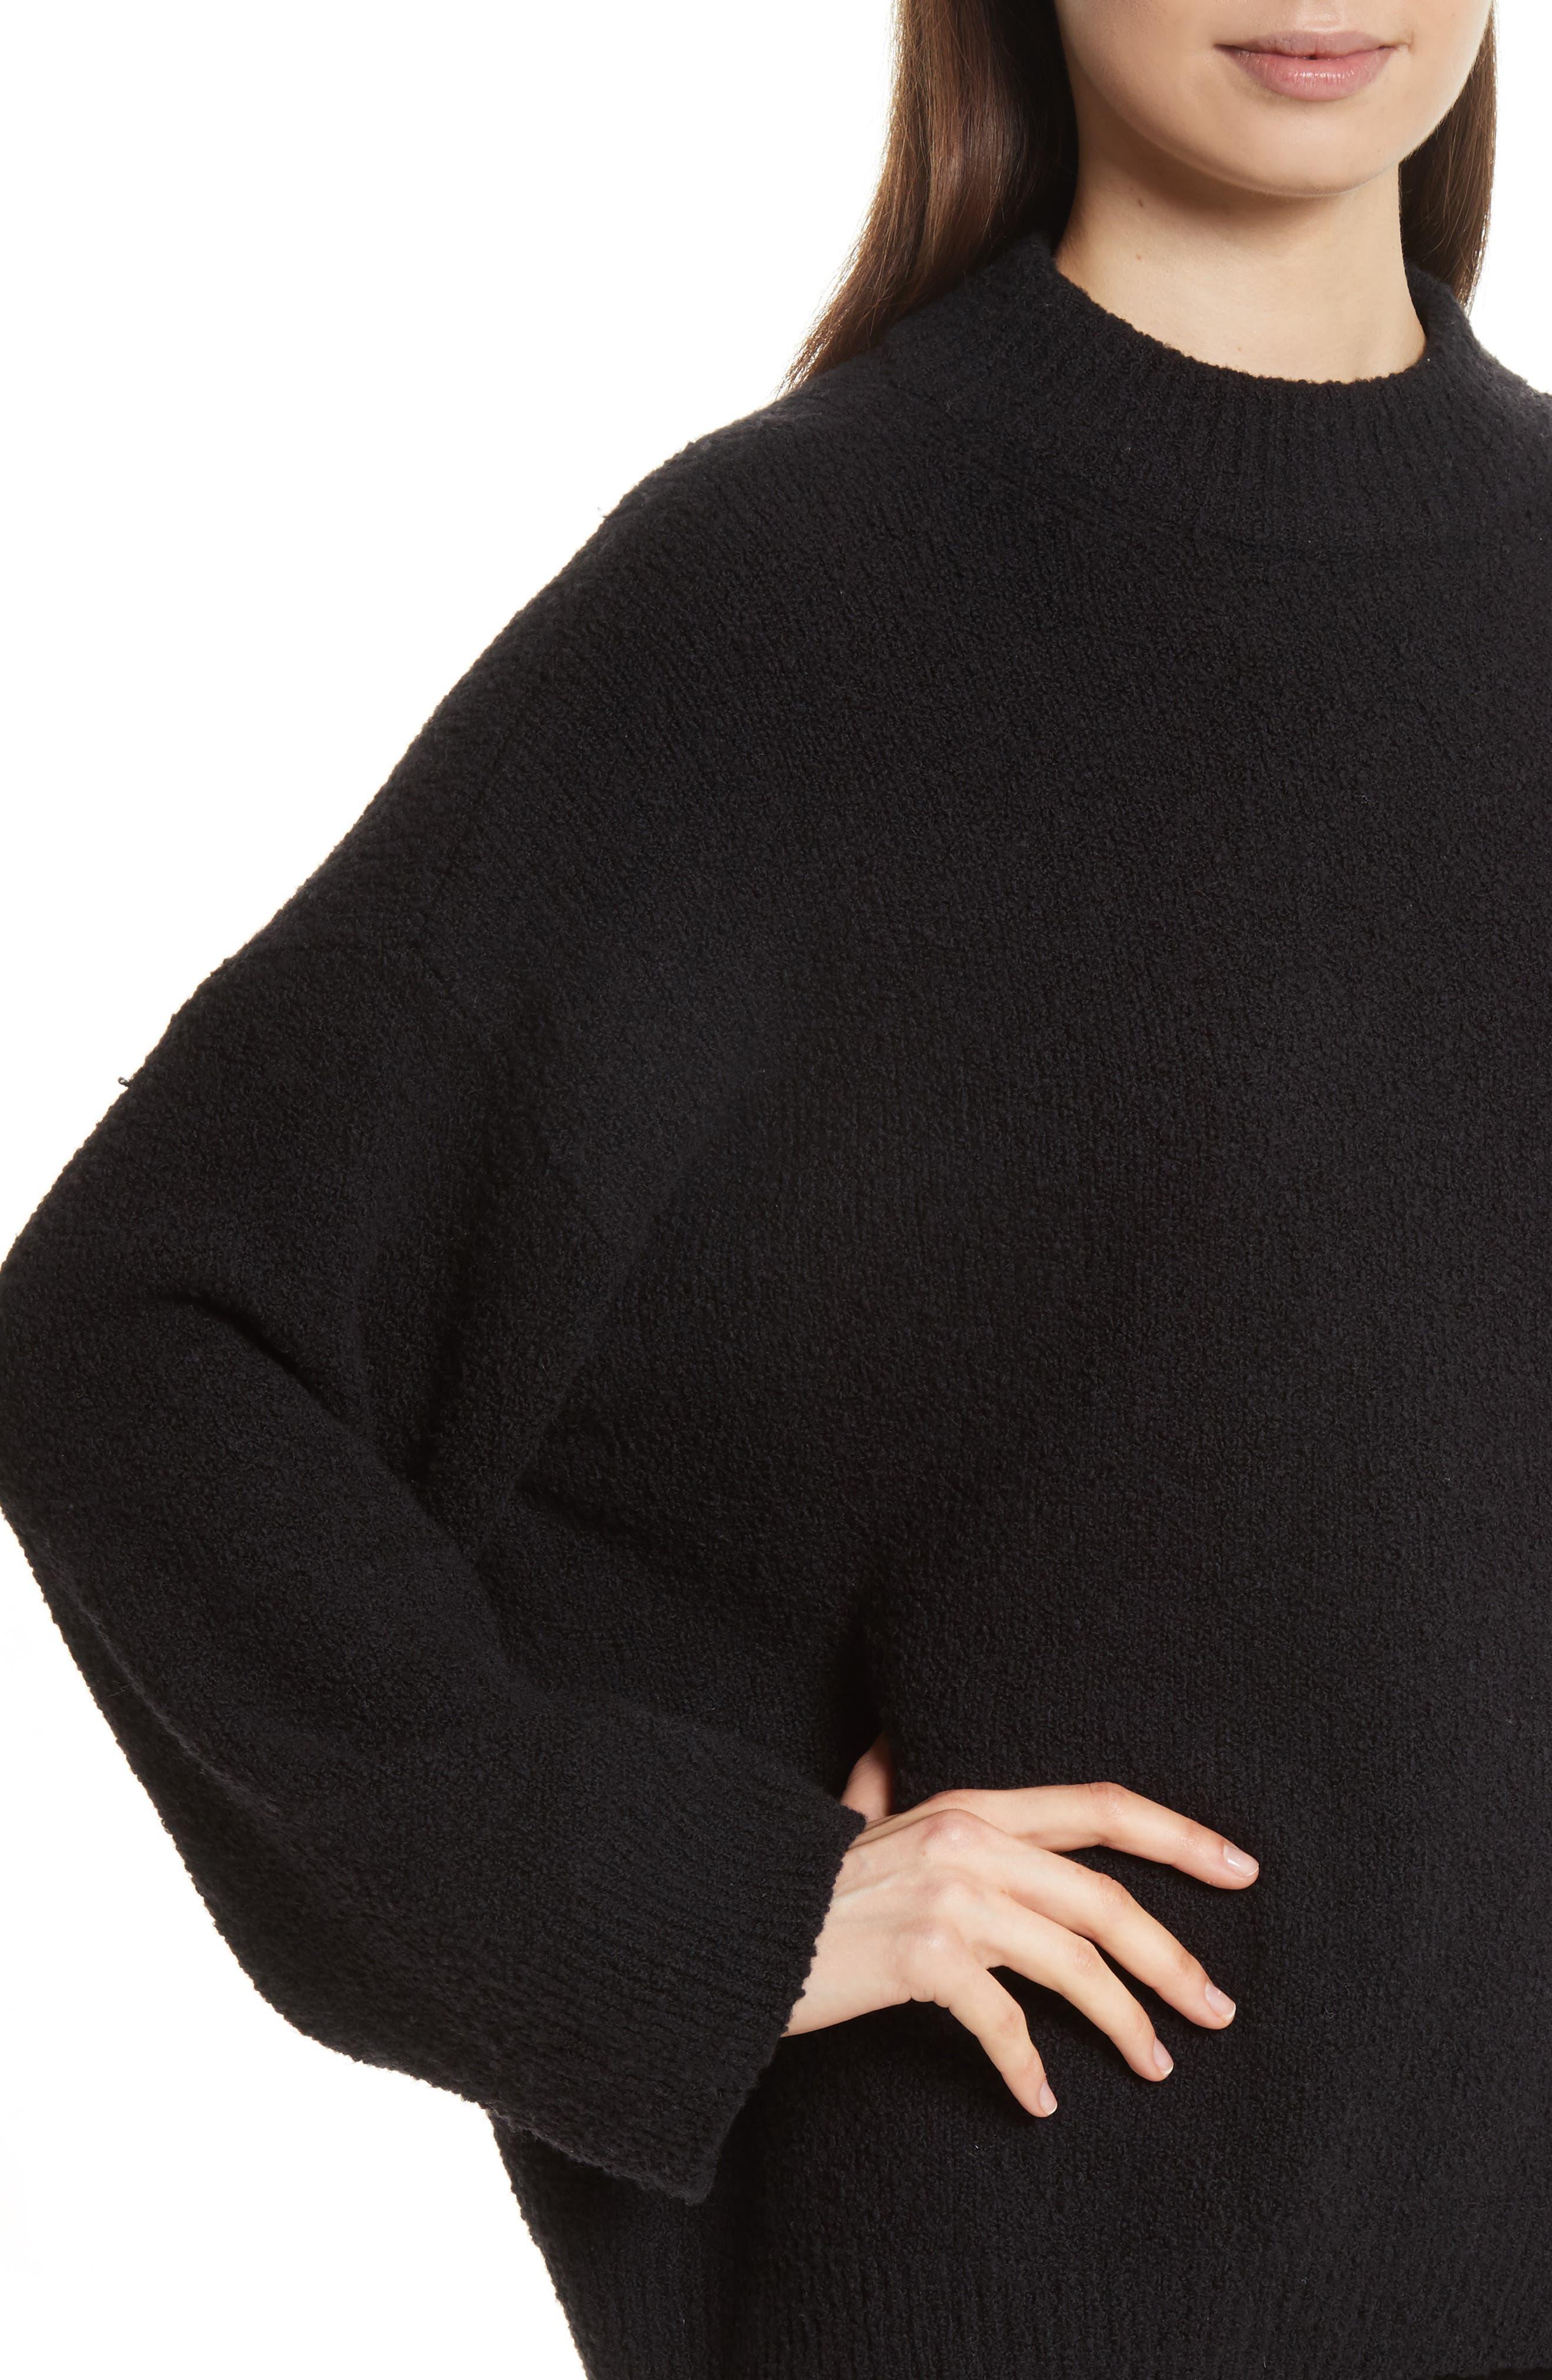 Boxy Knit Pullover,                             Alternate thumbnail 4, color,                             Black